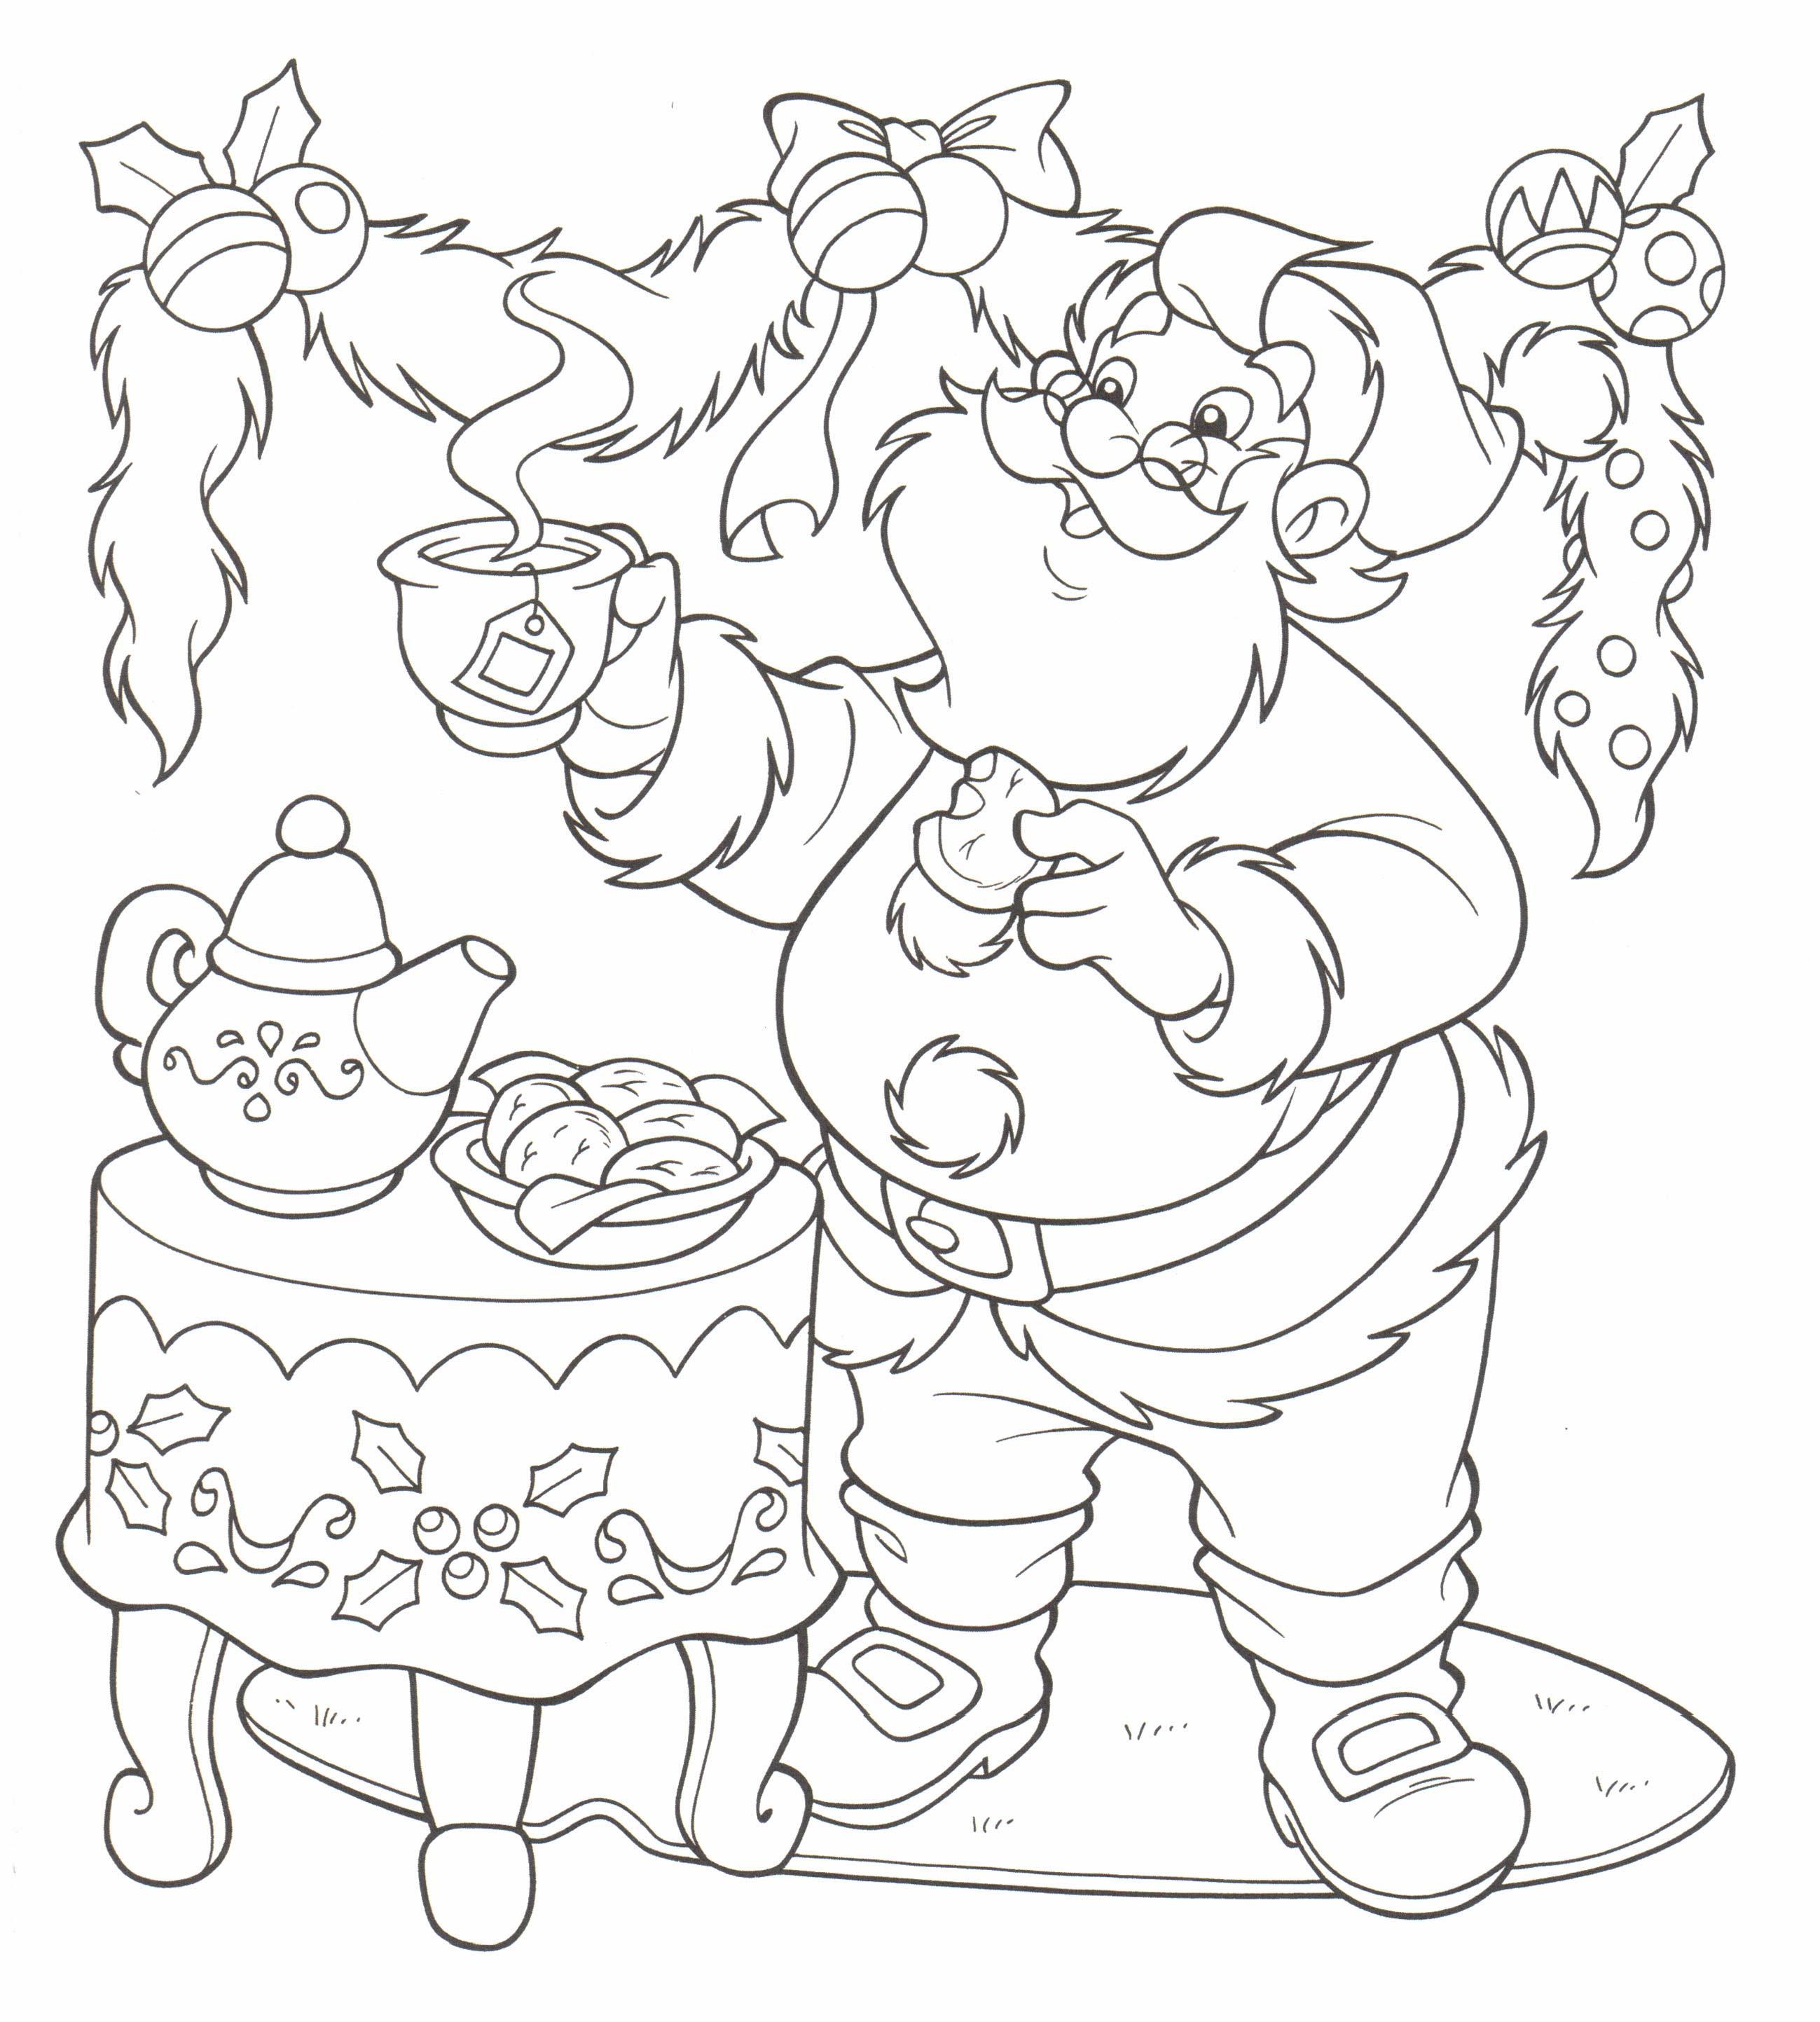 sfatulparintilor.ro_plansecolorat_mos craciun cu ceai si biscuiti